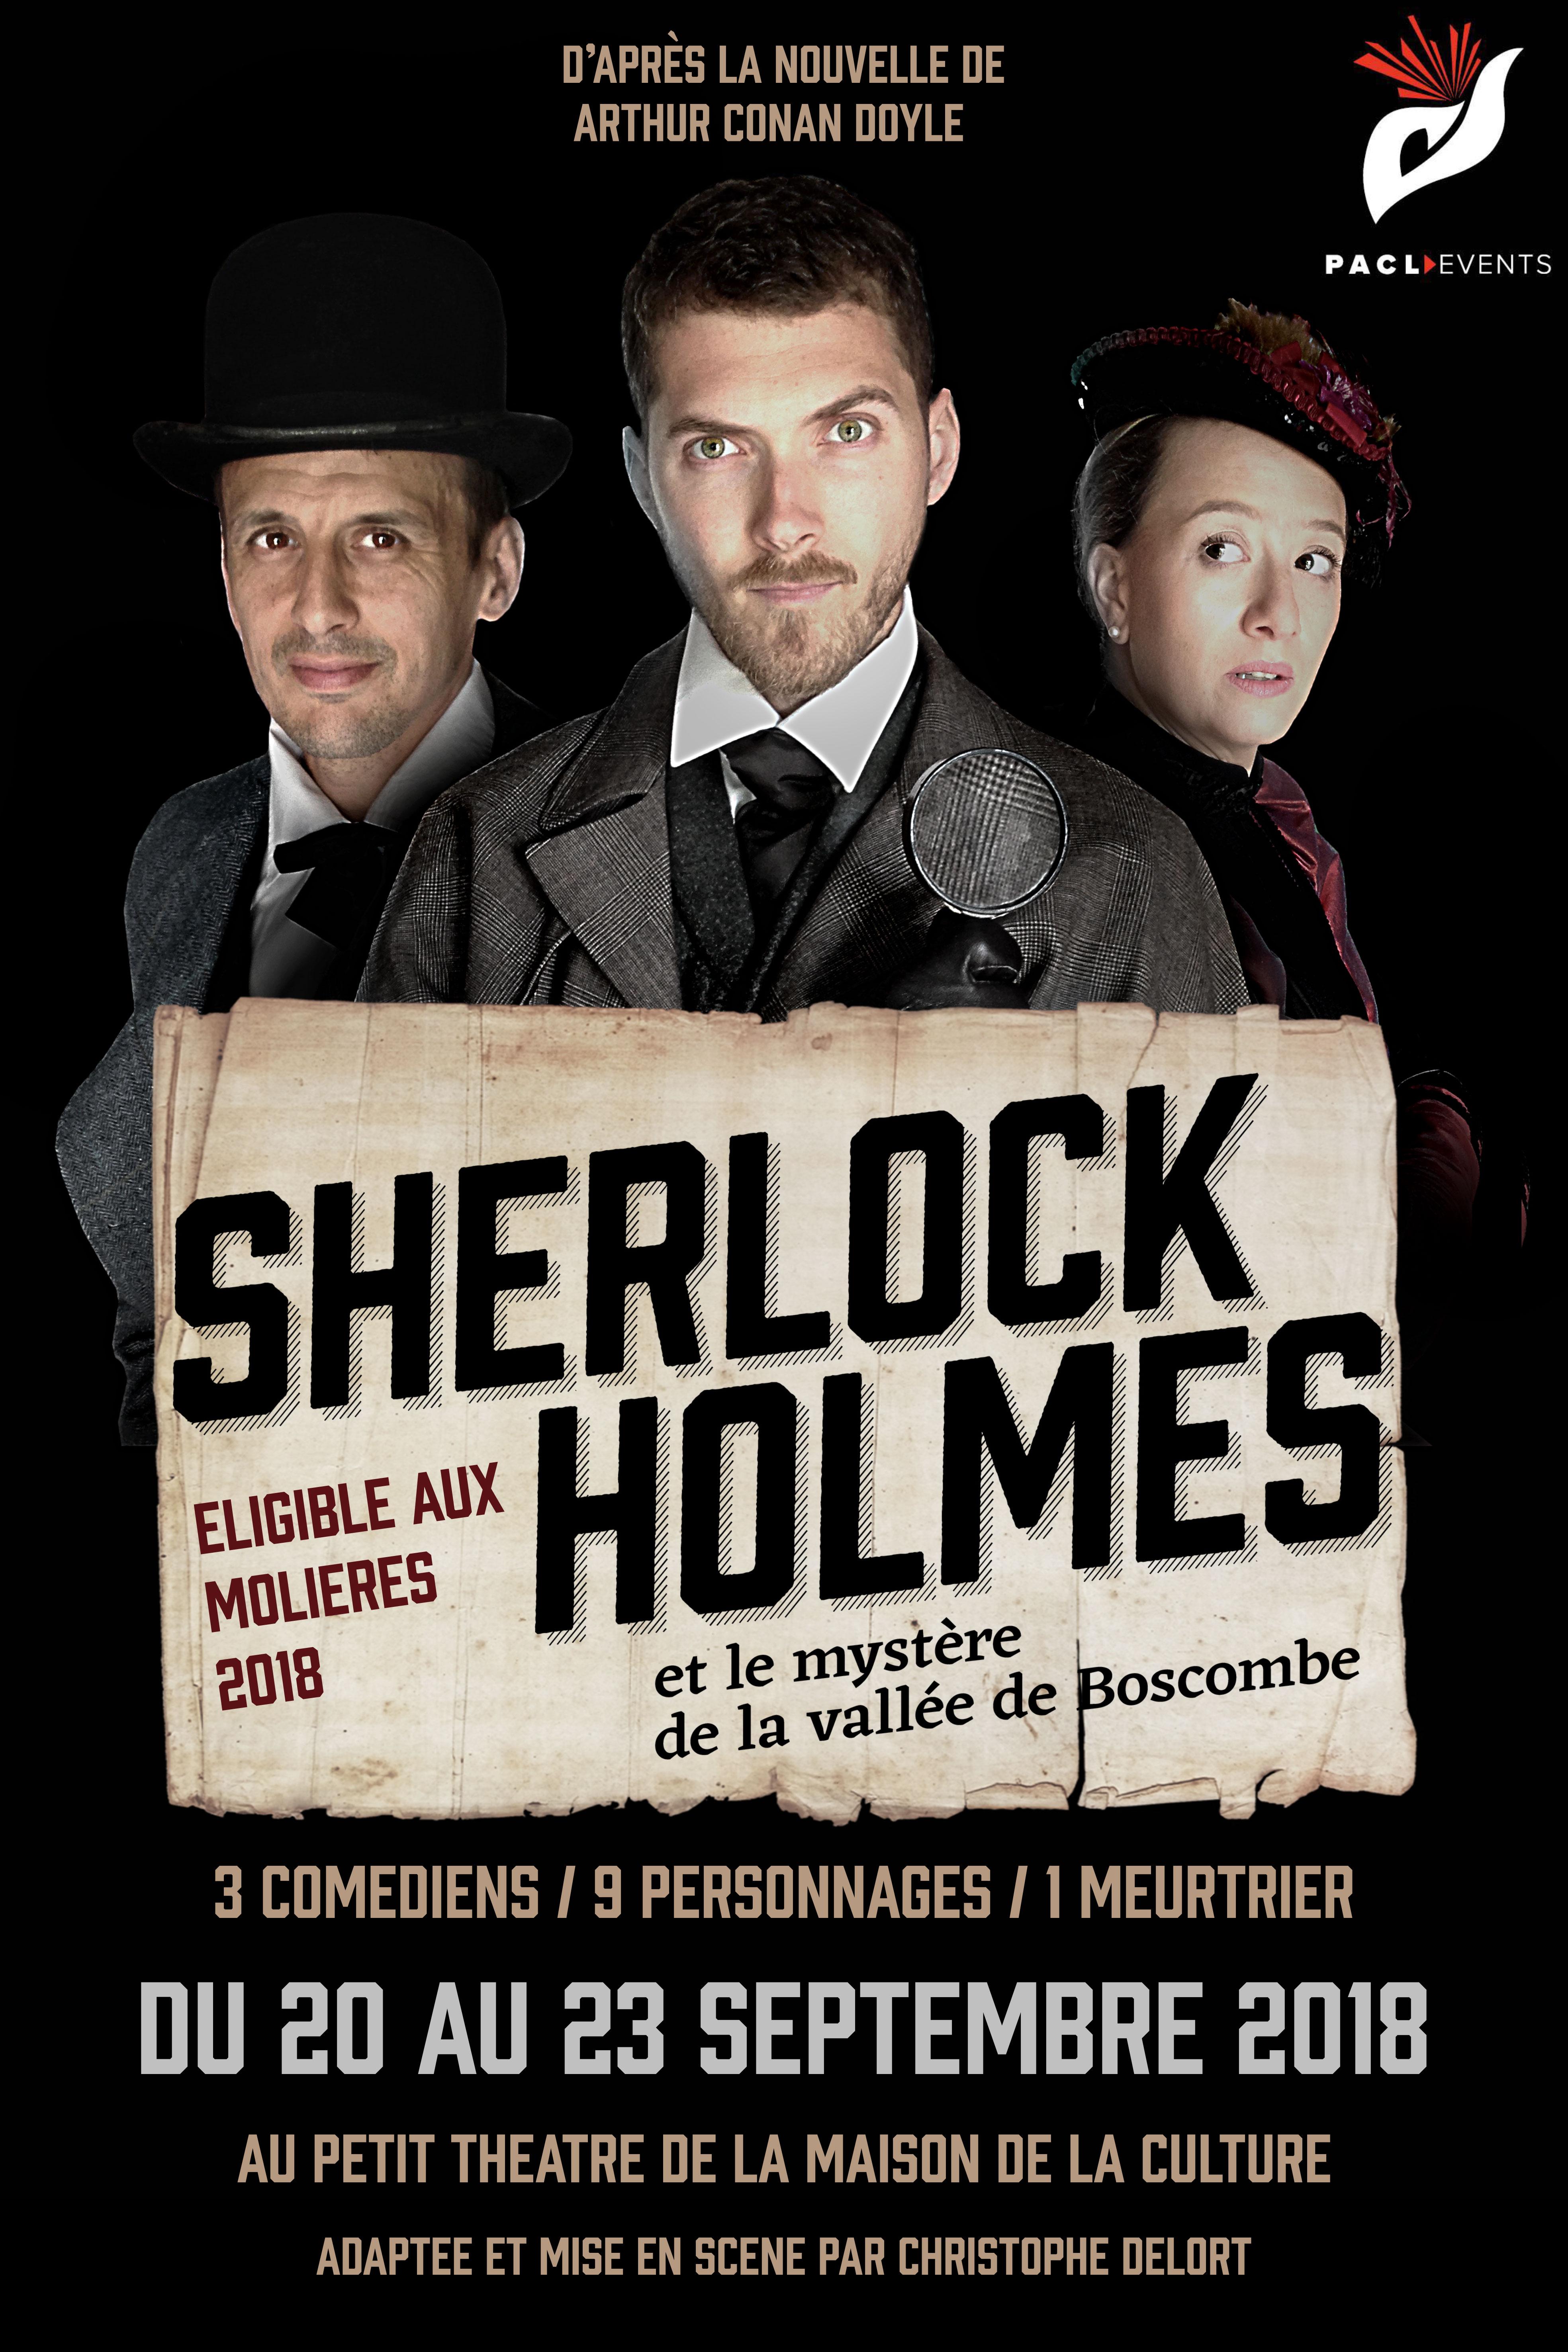 Sherlock Holmes vient mener une enquête à Tahiti